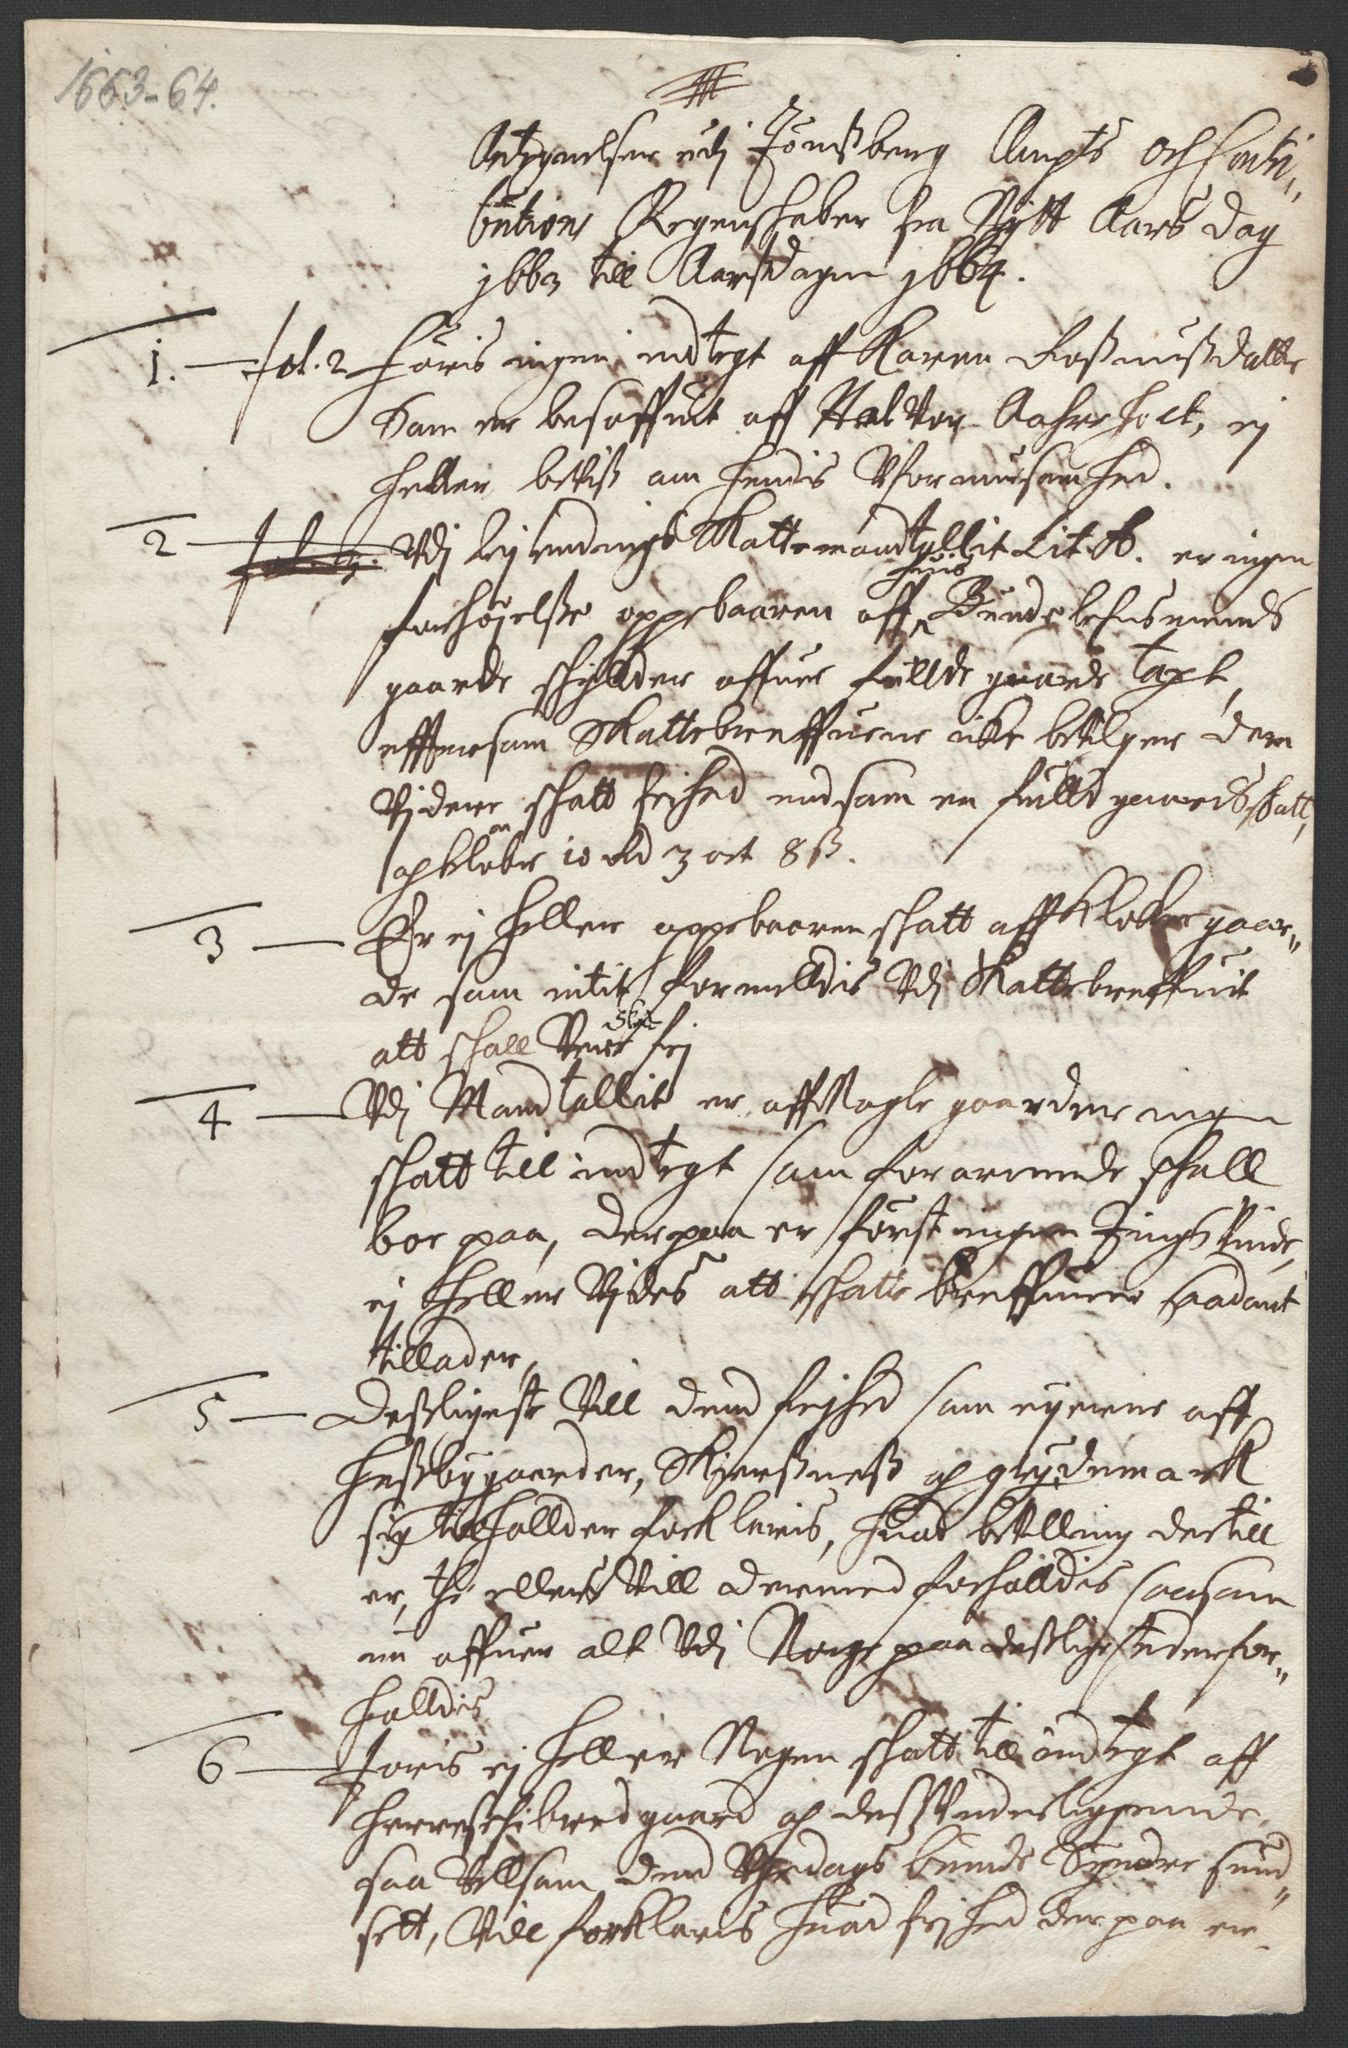 RA, Rentekammeret inntil 1814, Reviderte regnskaper, Fogderegnskap, R32/L1863: Fogderegnskap Jarlsberg grevskap, 1659-1687, s. 316